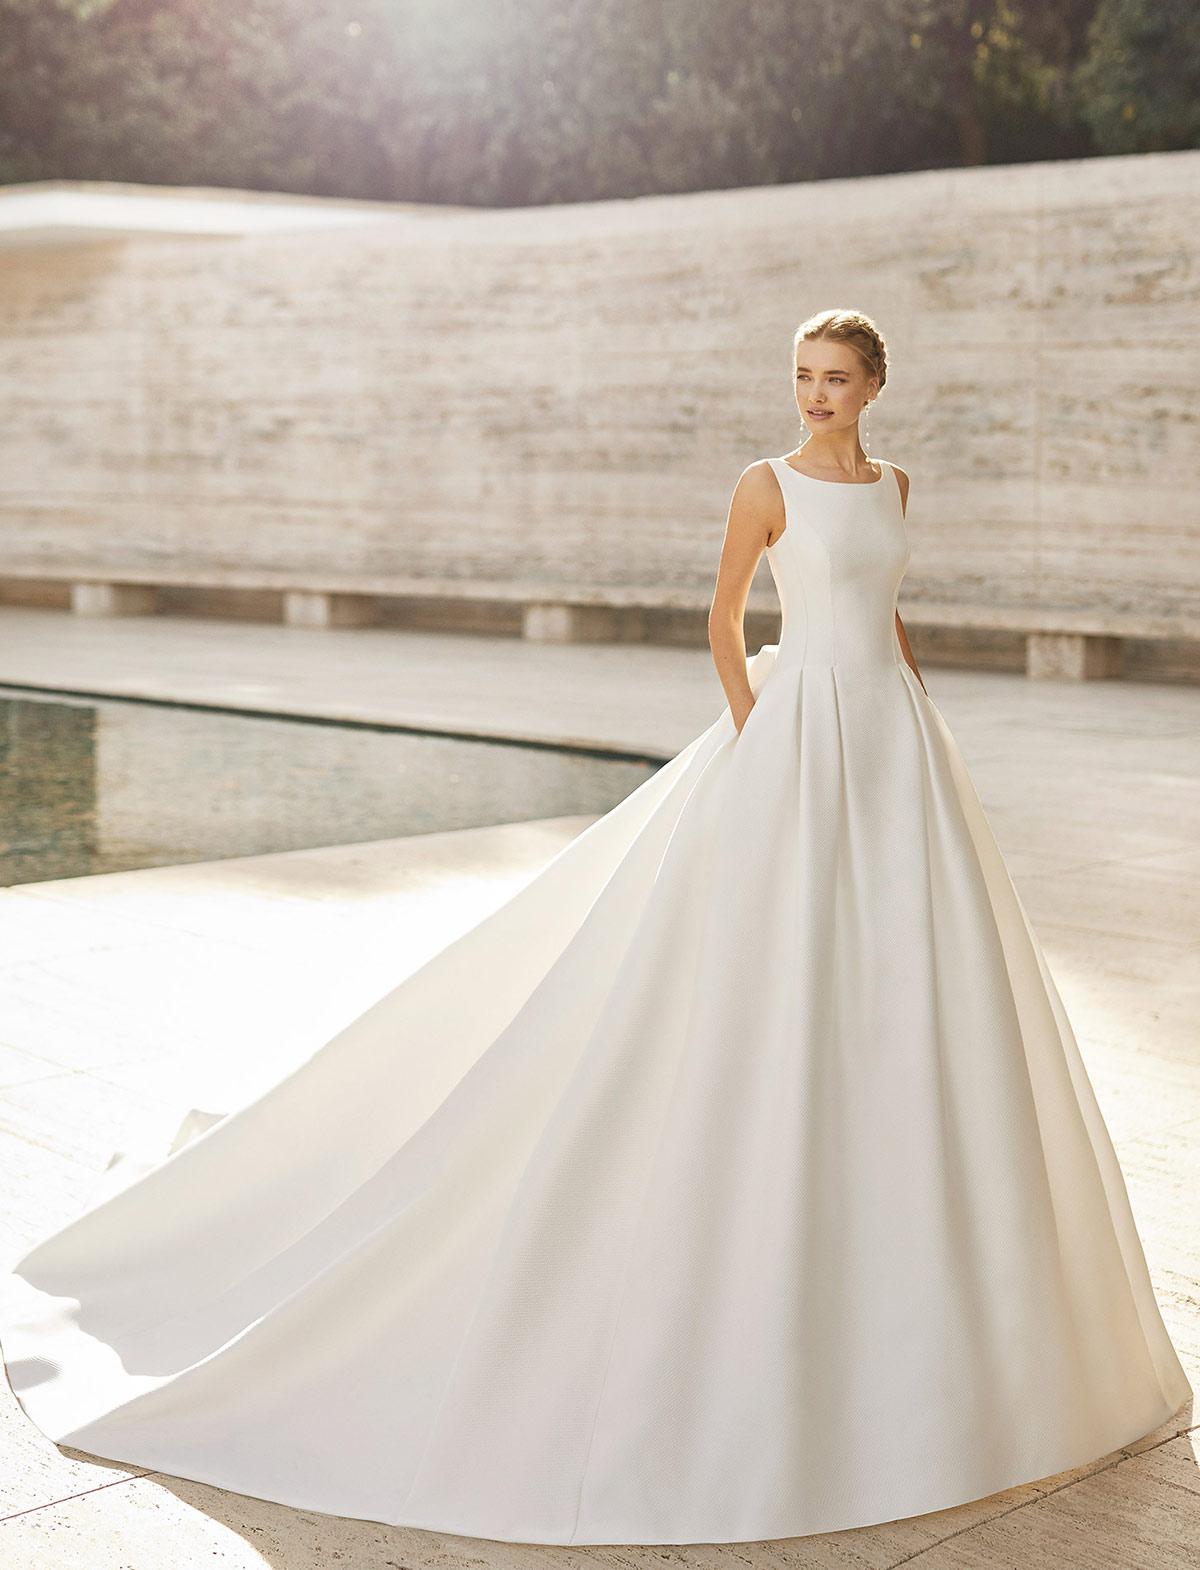 Rosa Clarà Couture Elaine Abito Sposa 2021